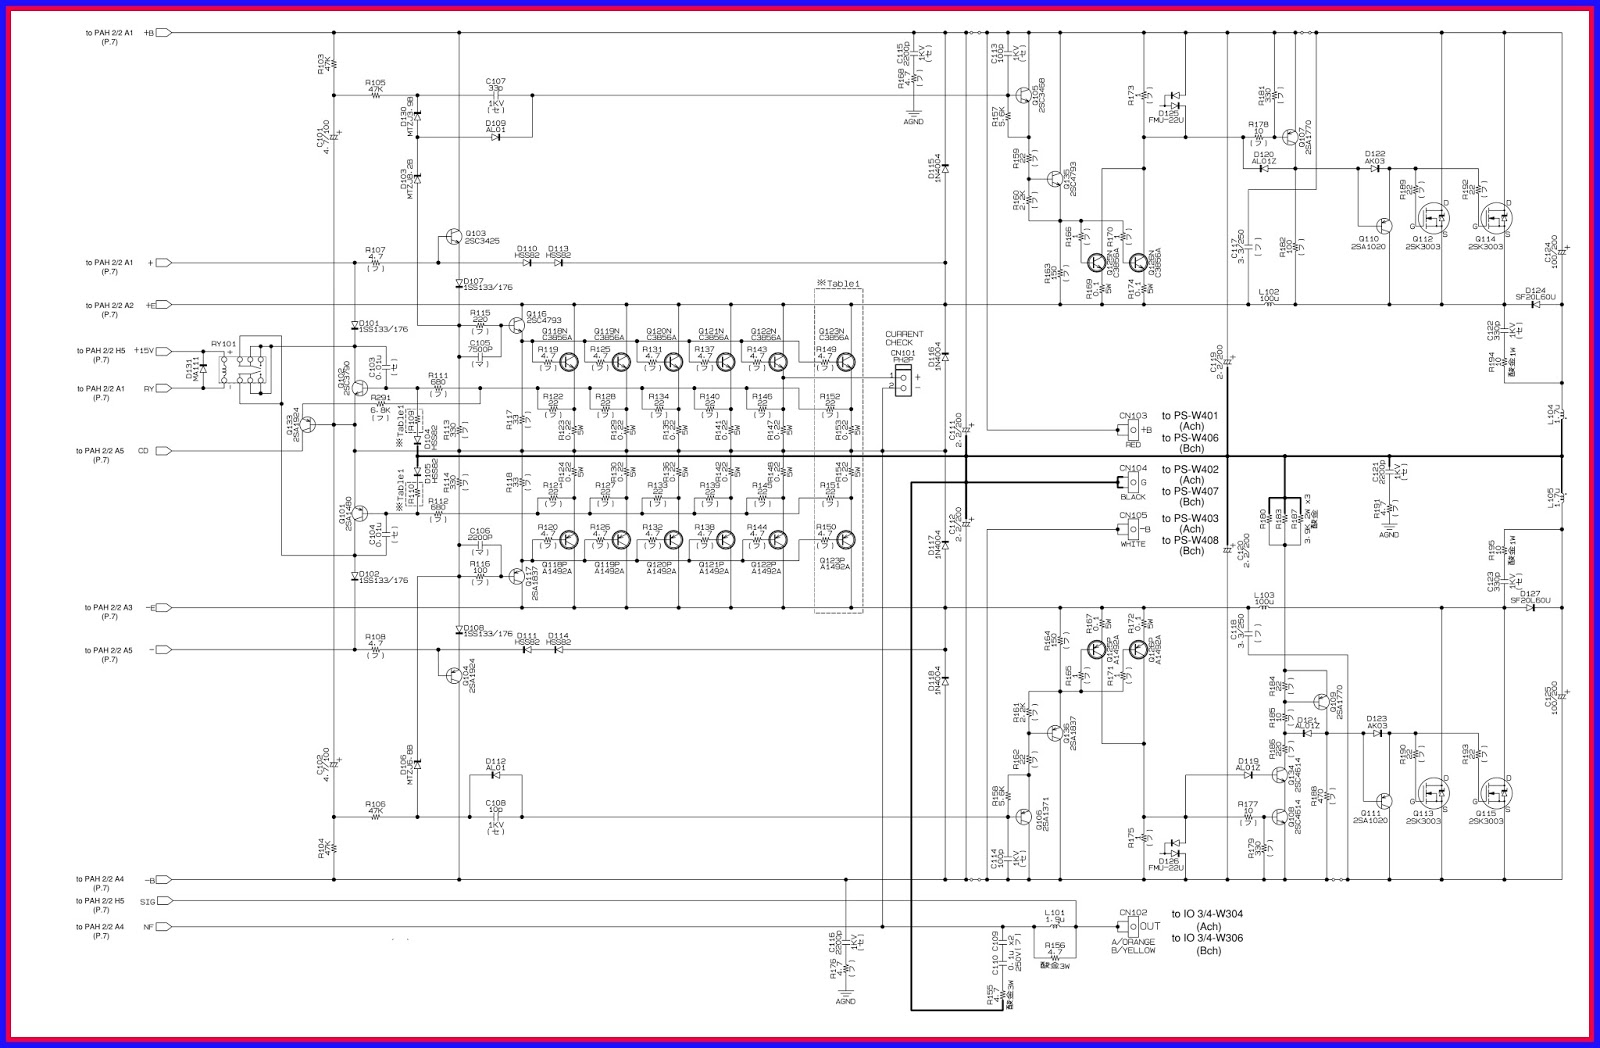 small resolution of yamaha amp schematic wiring diagram technicyamaha amp schematic wiring diagram insideyamaha amp schematic wiring diagram expert